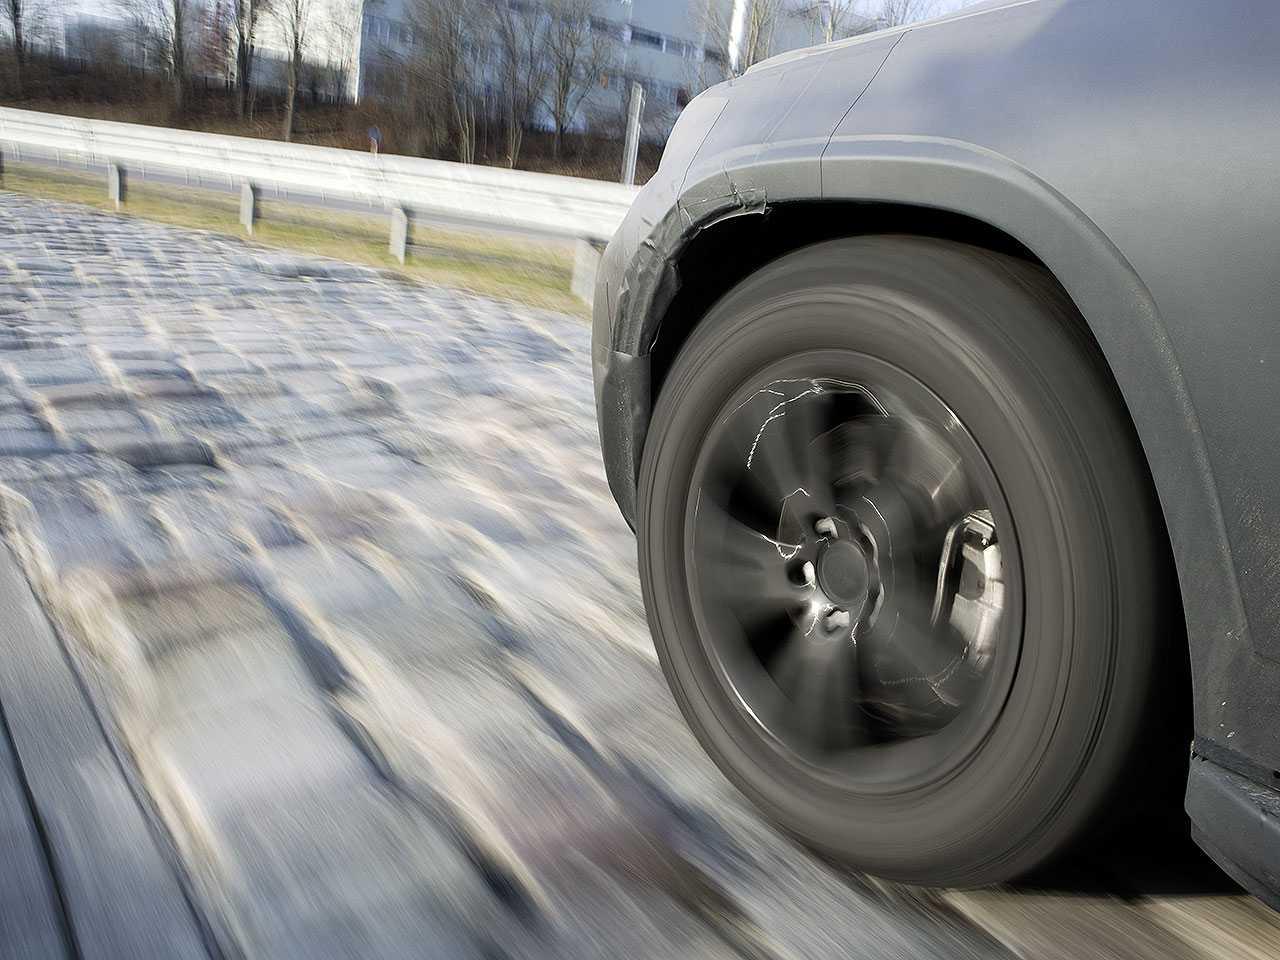 Tecnologia permitirá que o motorista evite buracos e outras imperfeições do piso